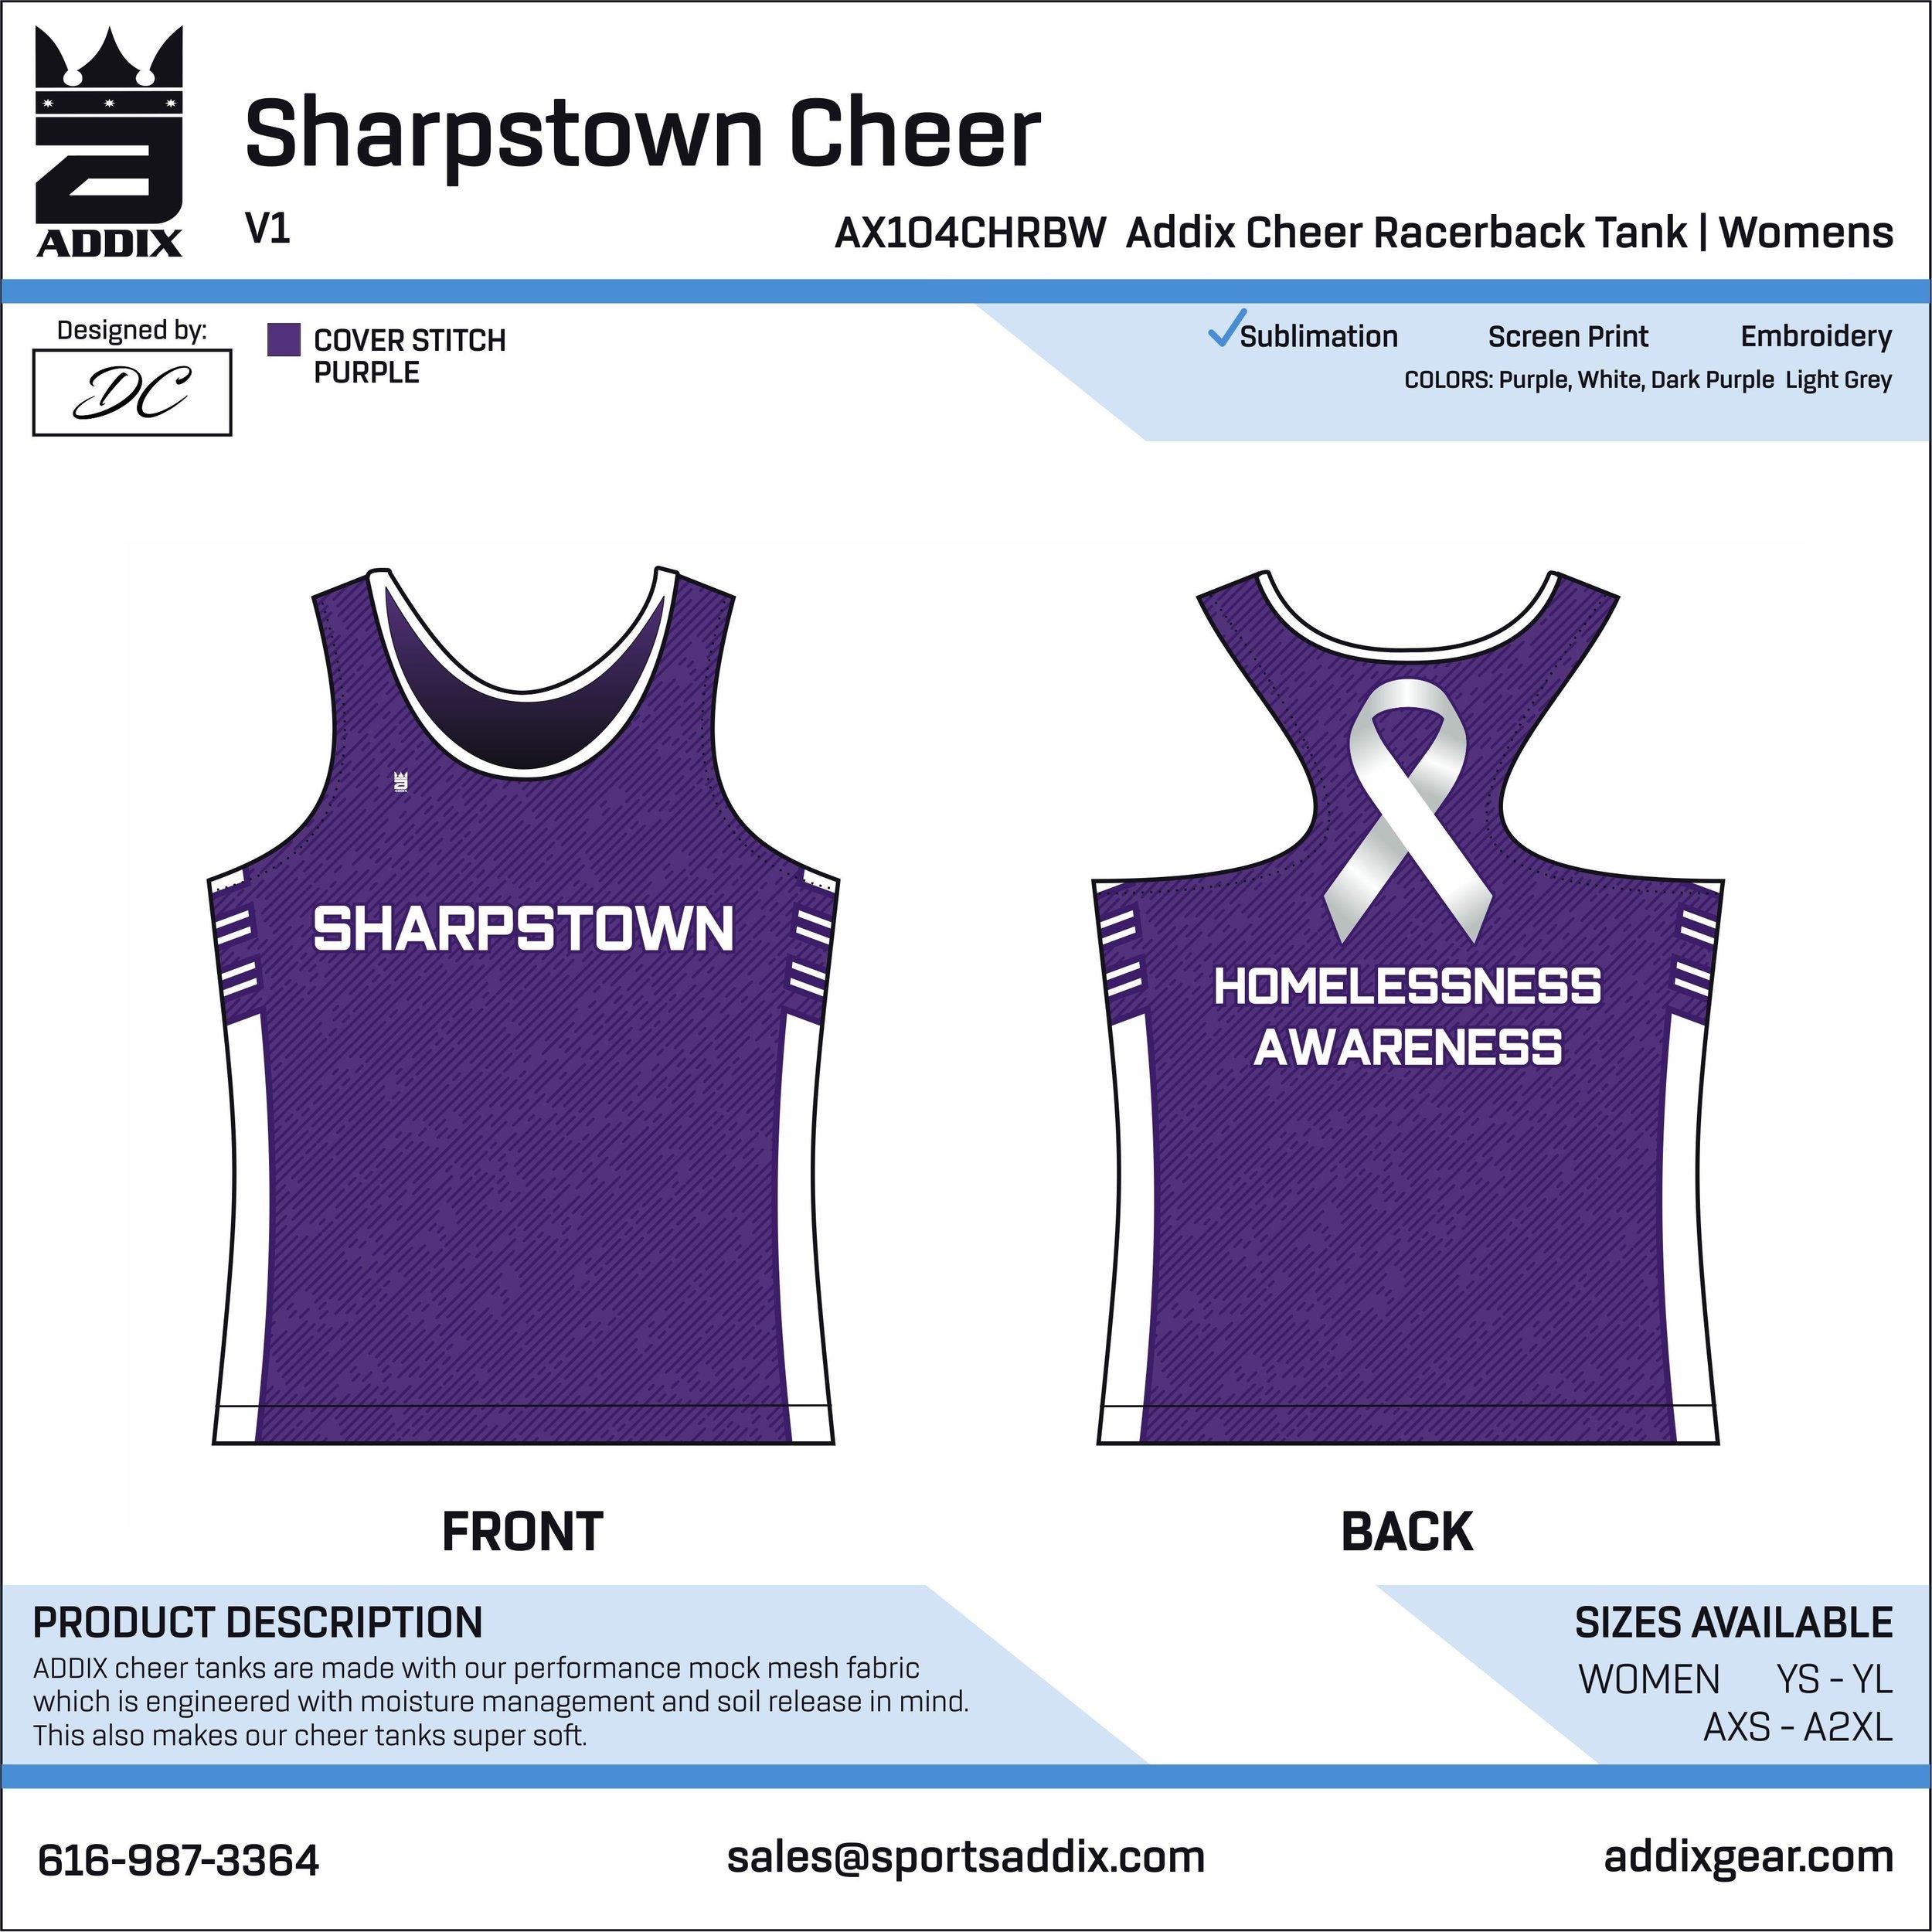 Sharpstown Cheer_2019_8-15_DC_Cheer Tank.jpg